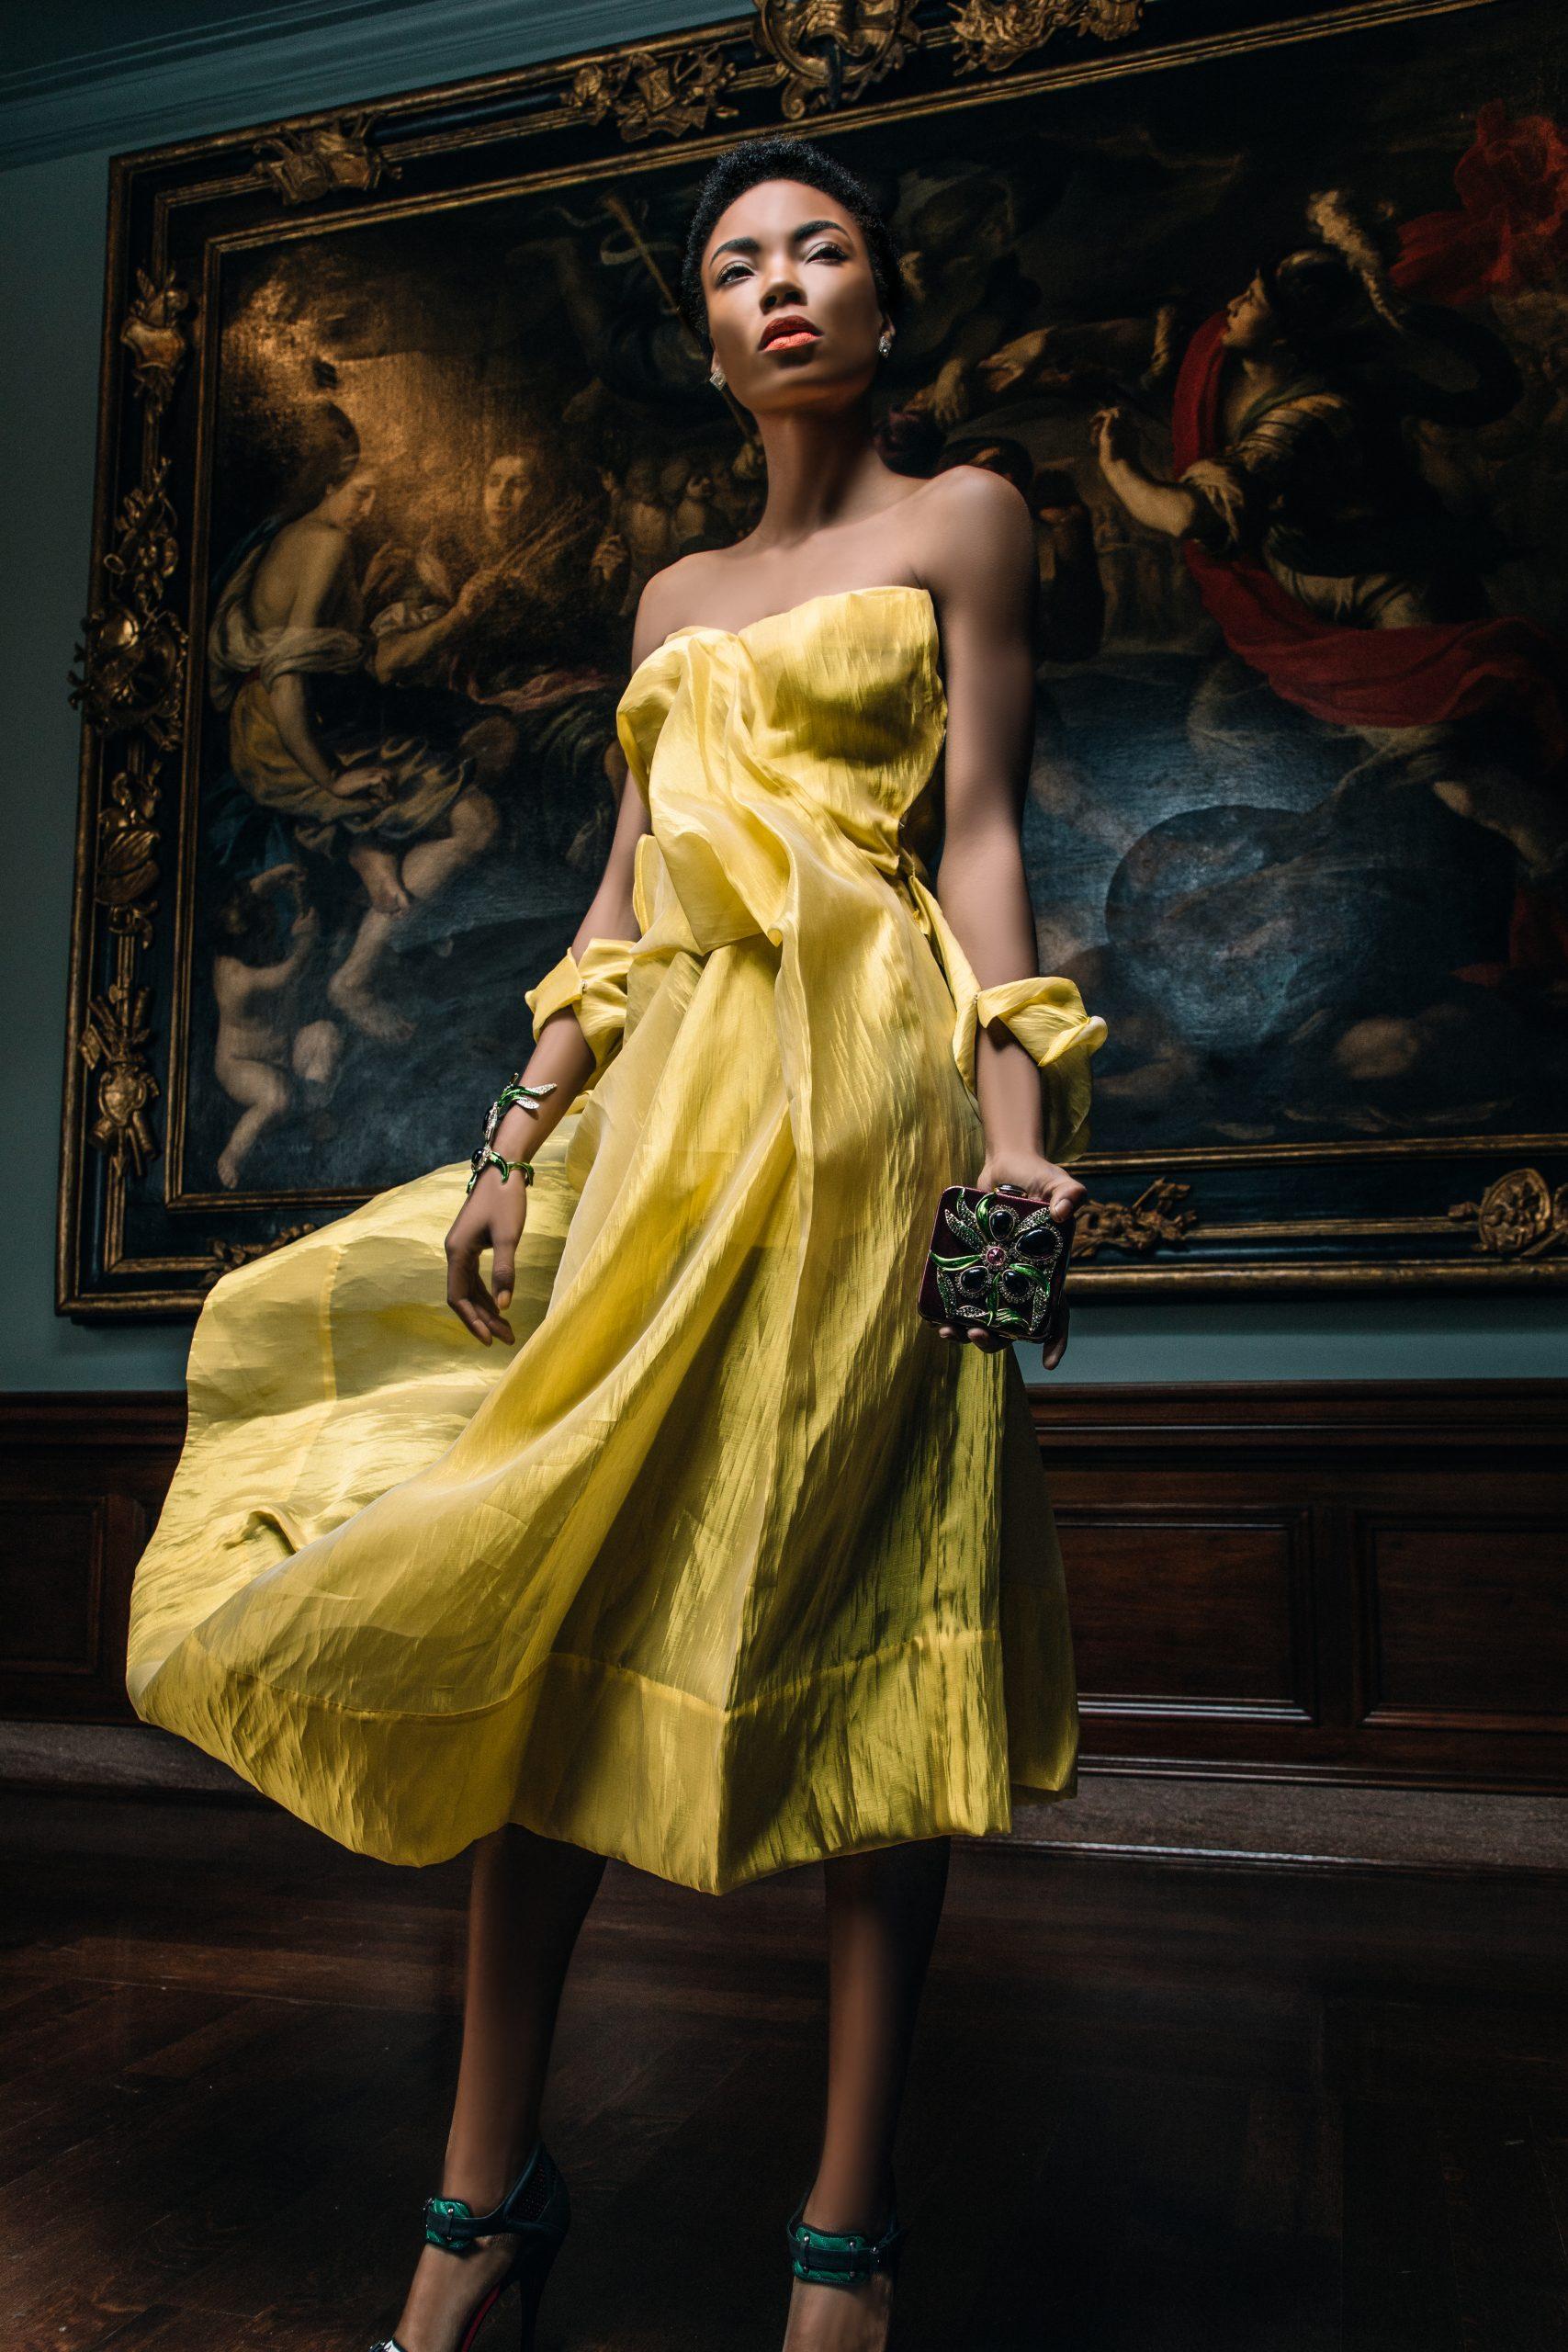 A model in a yellow YOHJI YAMAMOTO dress, sold by Evolution, at the Cincinnati Art Museum